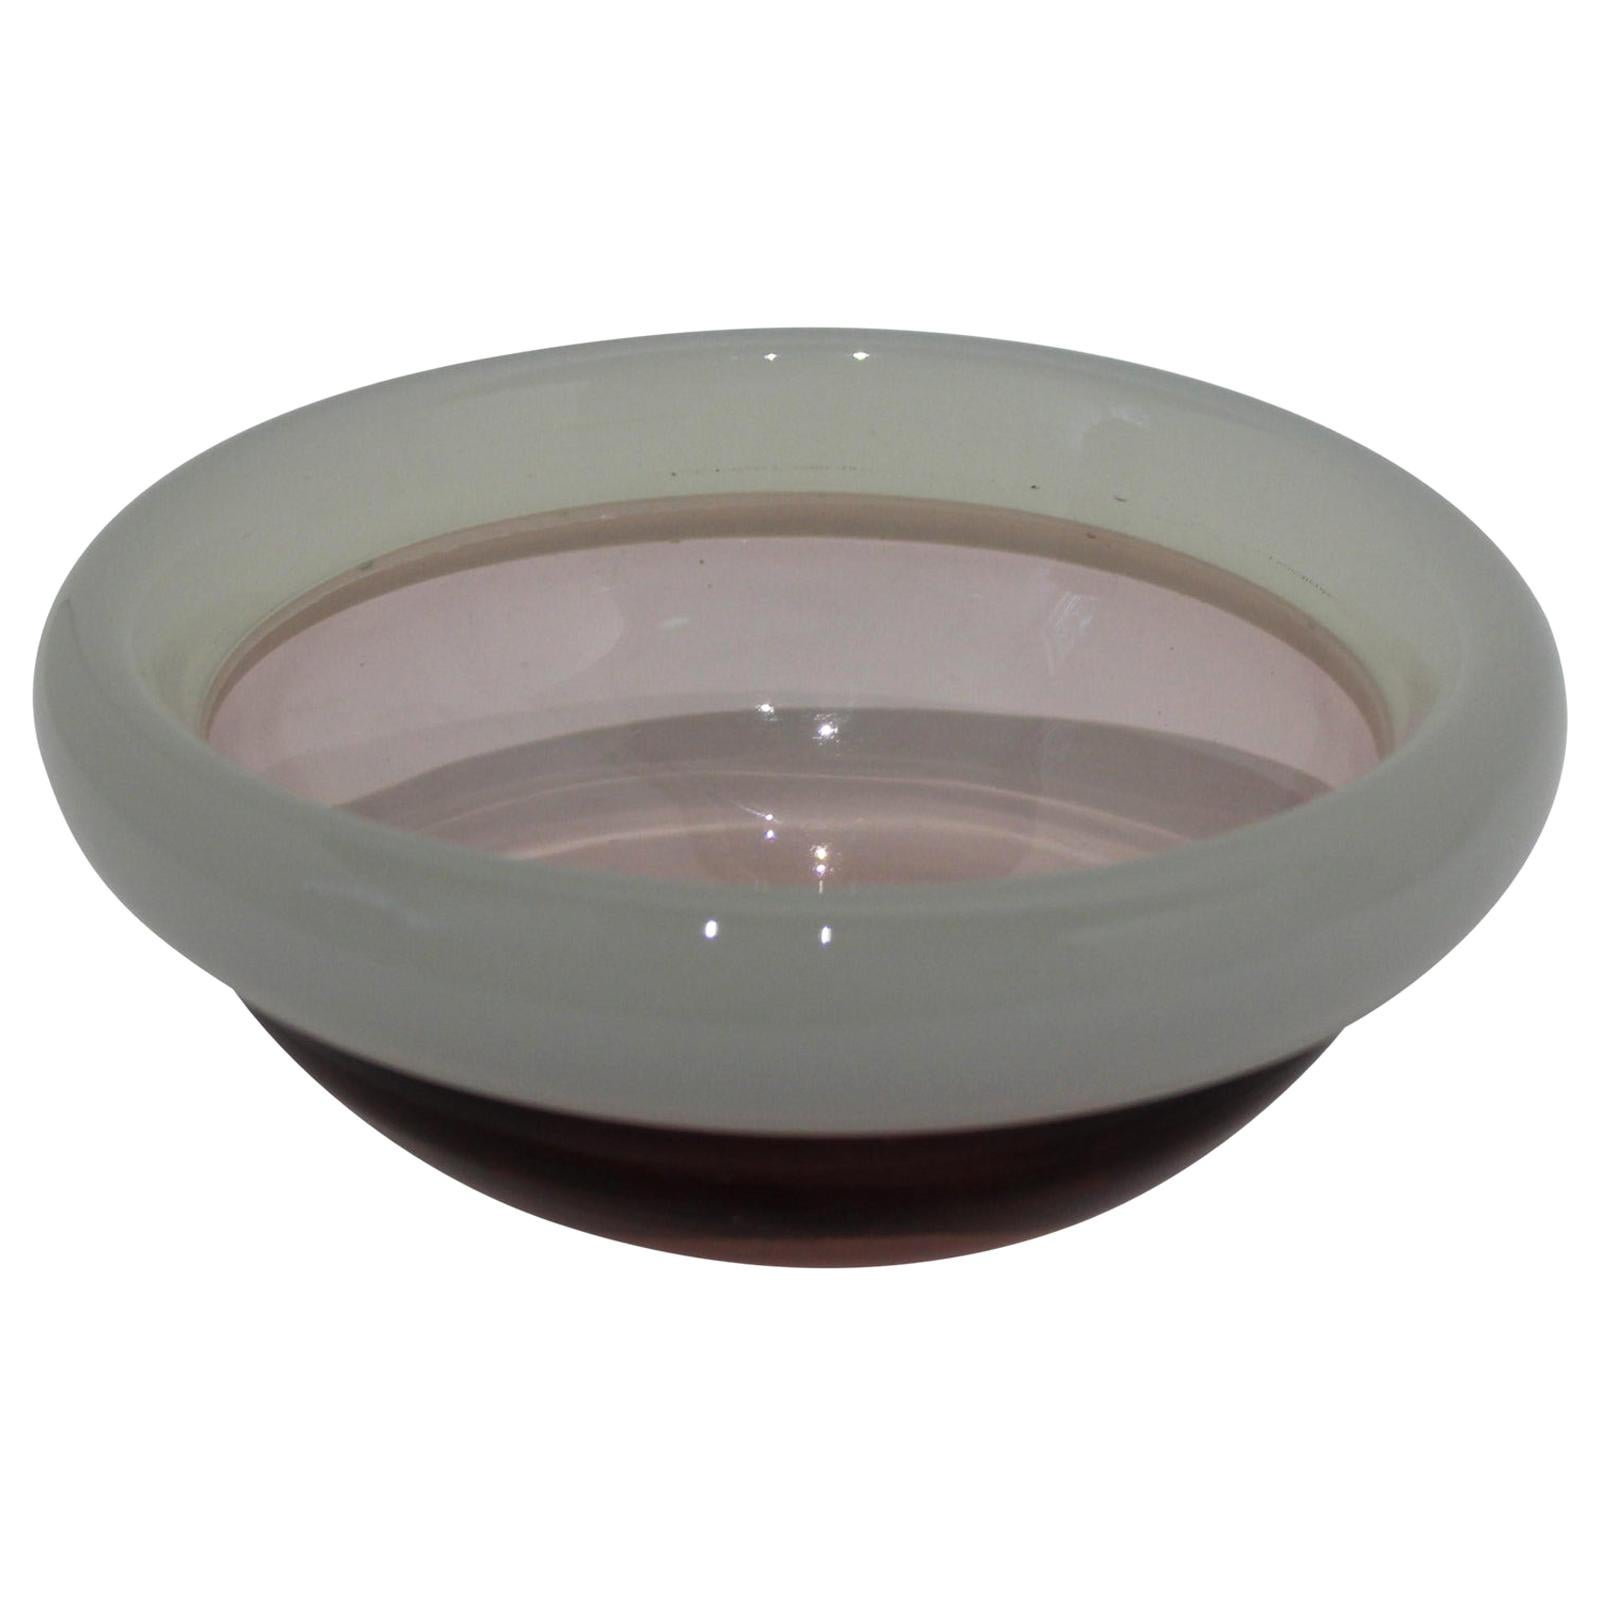 Murano Glass Bowl by Seguso